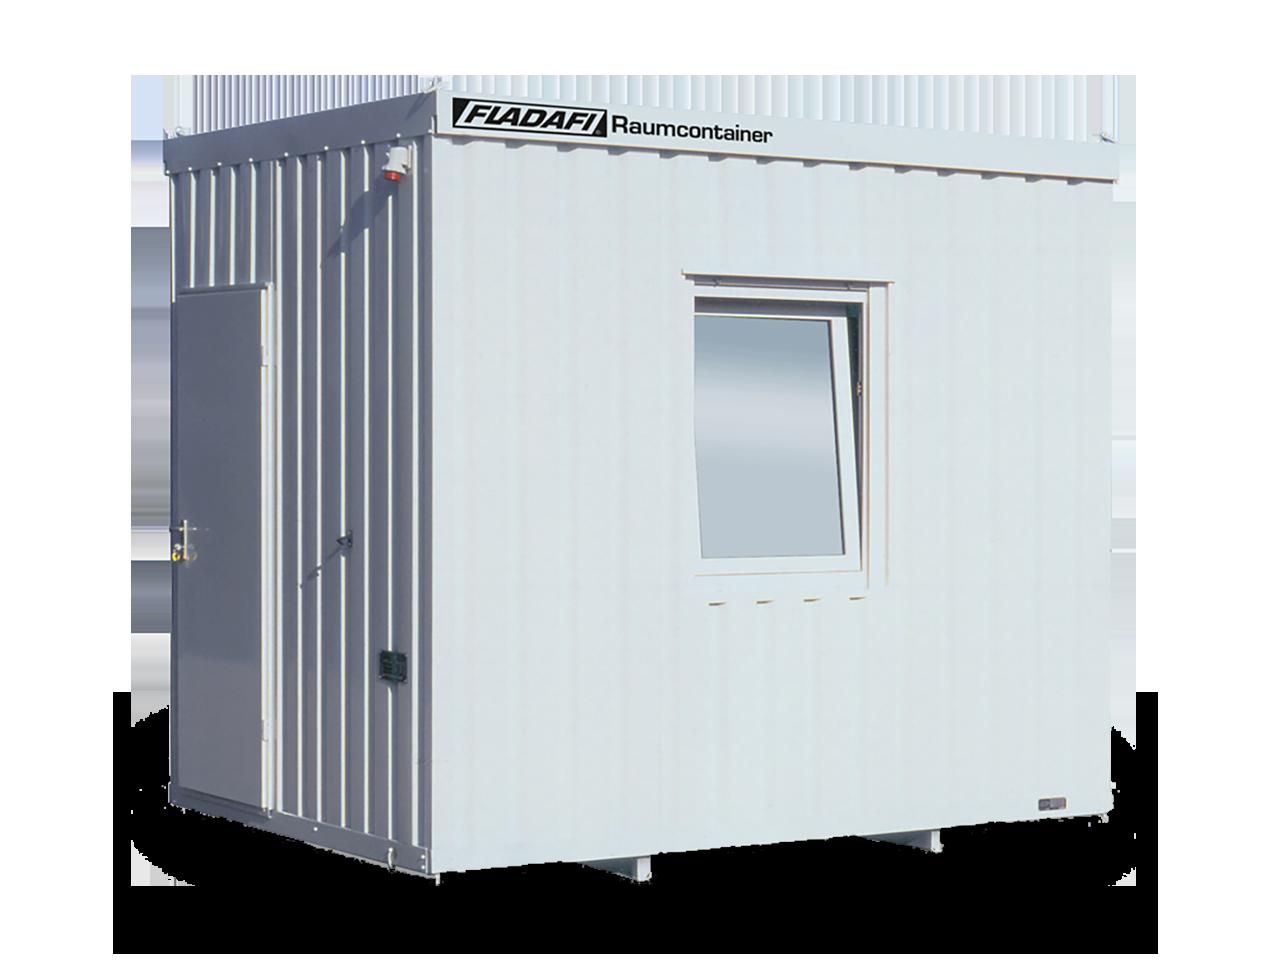 6831_FLADAFI-Raumcontainer-3M-6831_RC3M6831_RGB_0014_ft_sn_sl.png